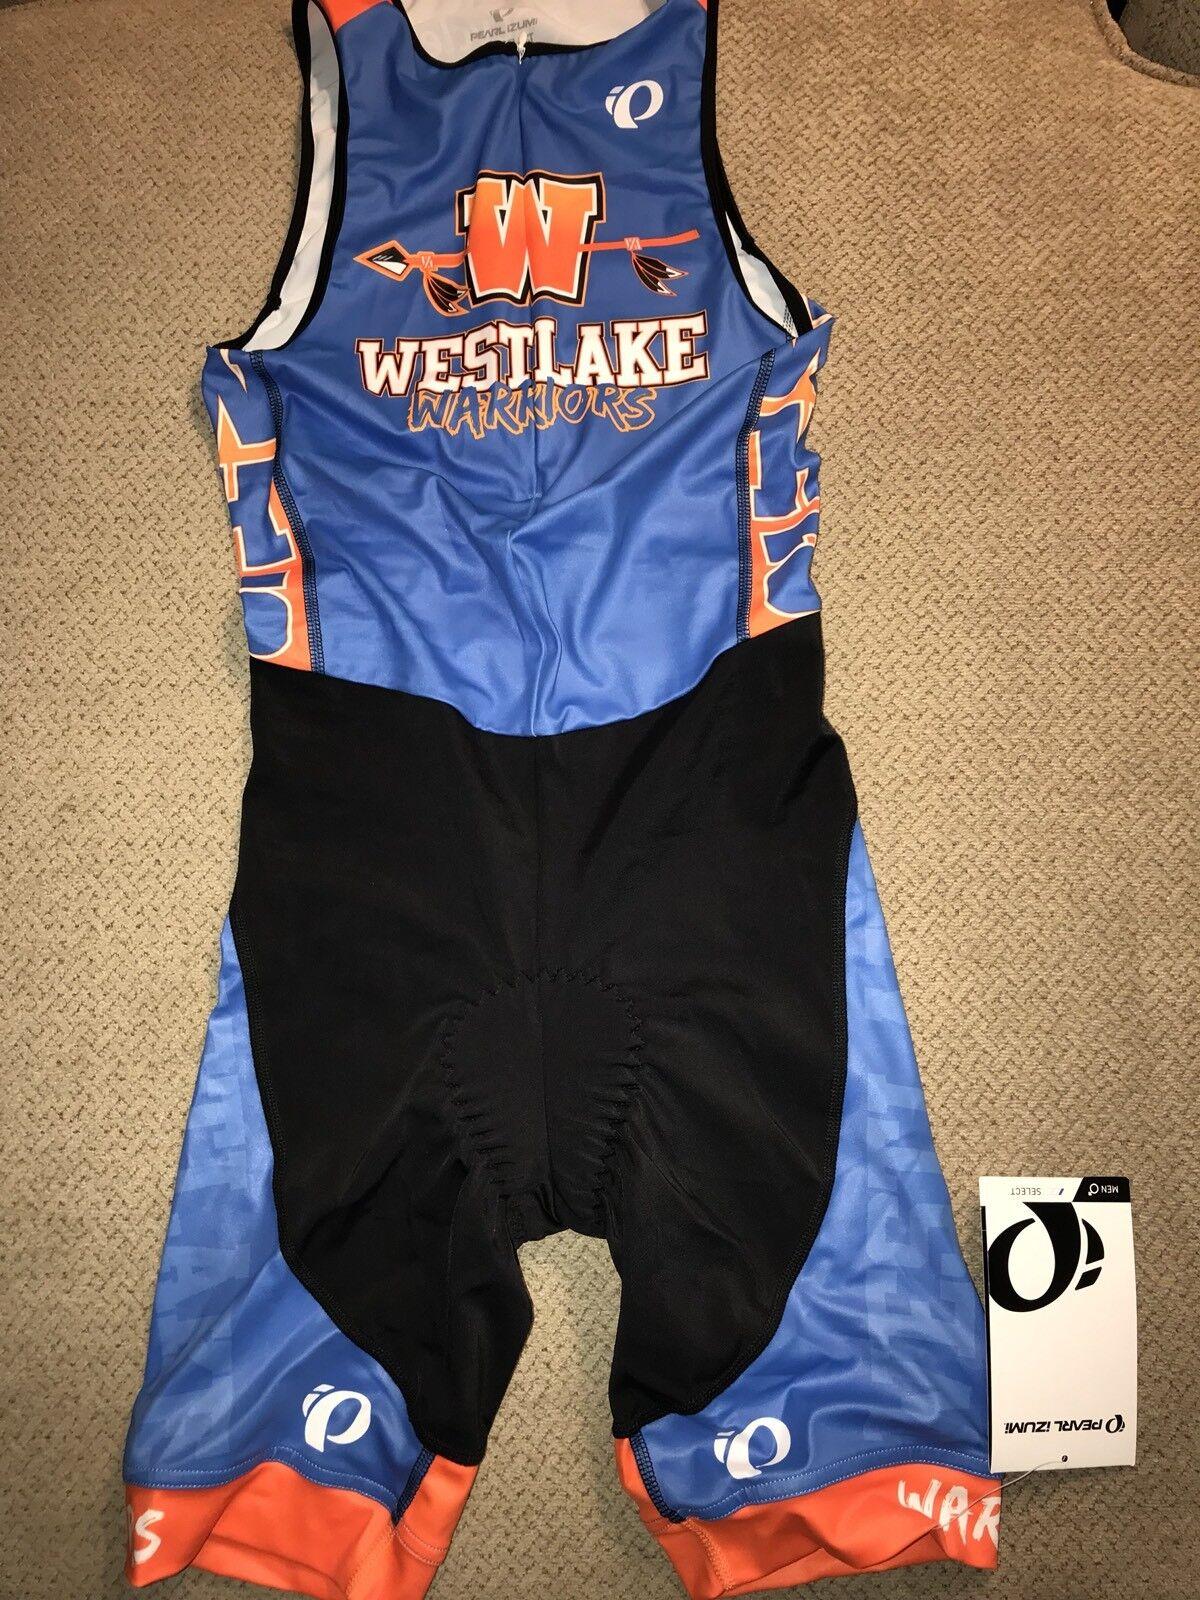 Men's Westlake Warriors Triathlon Skinsuit Singlet Speedsuit Medium M Cycling